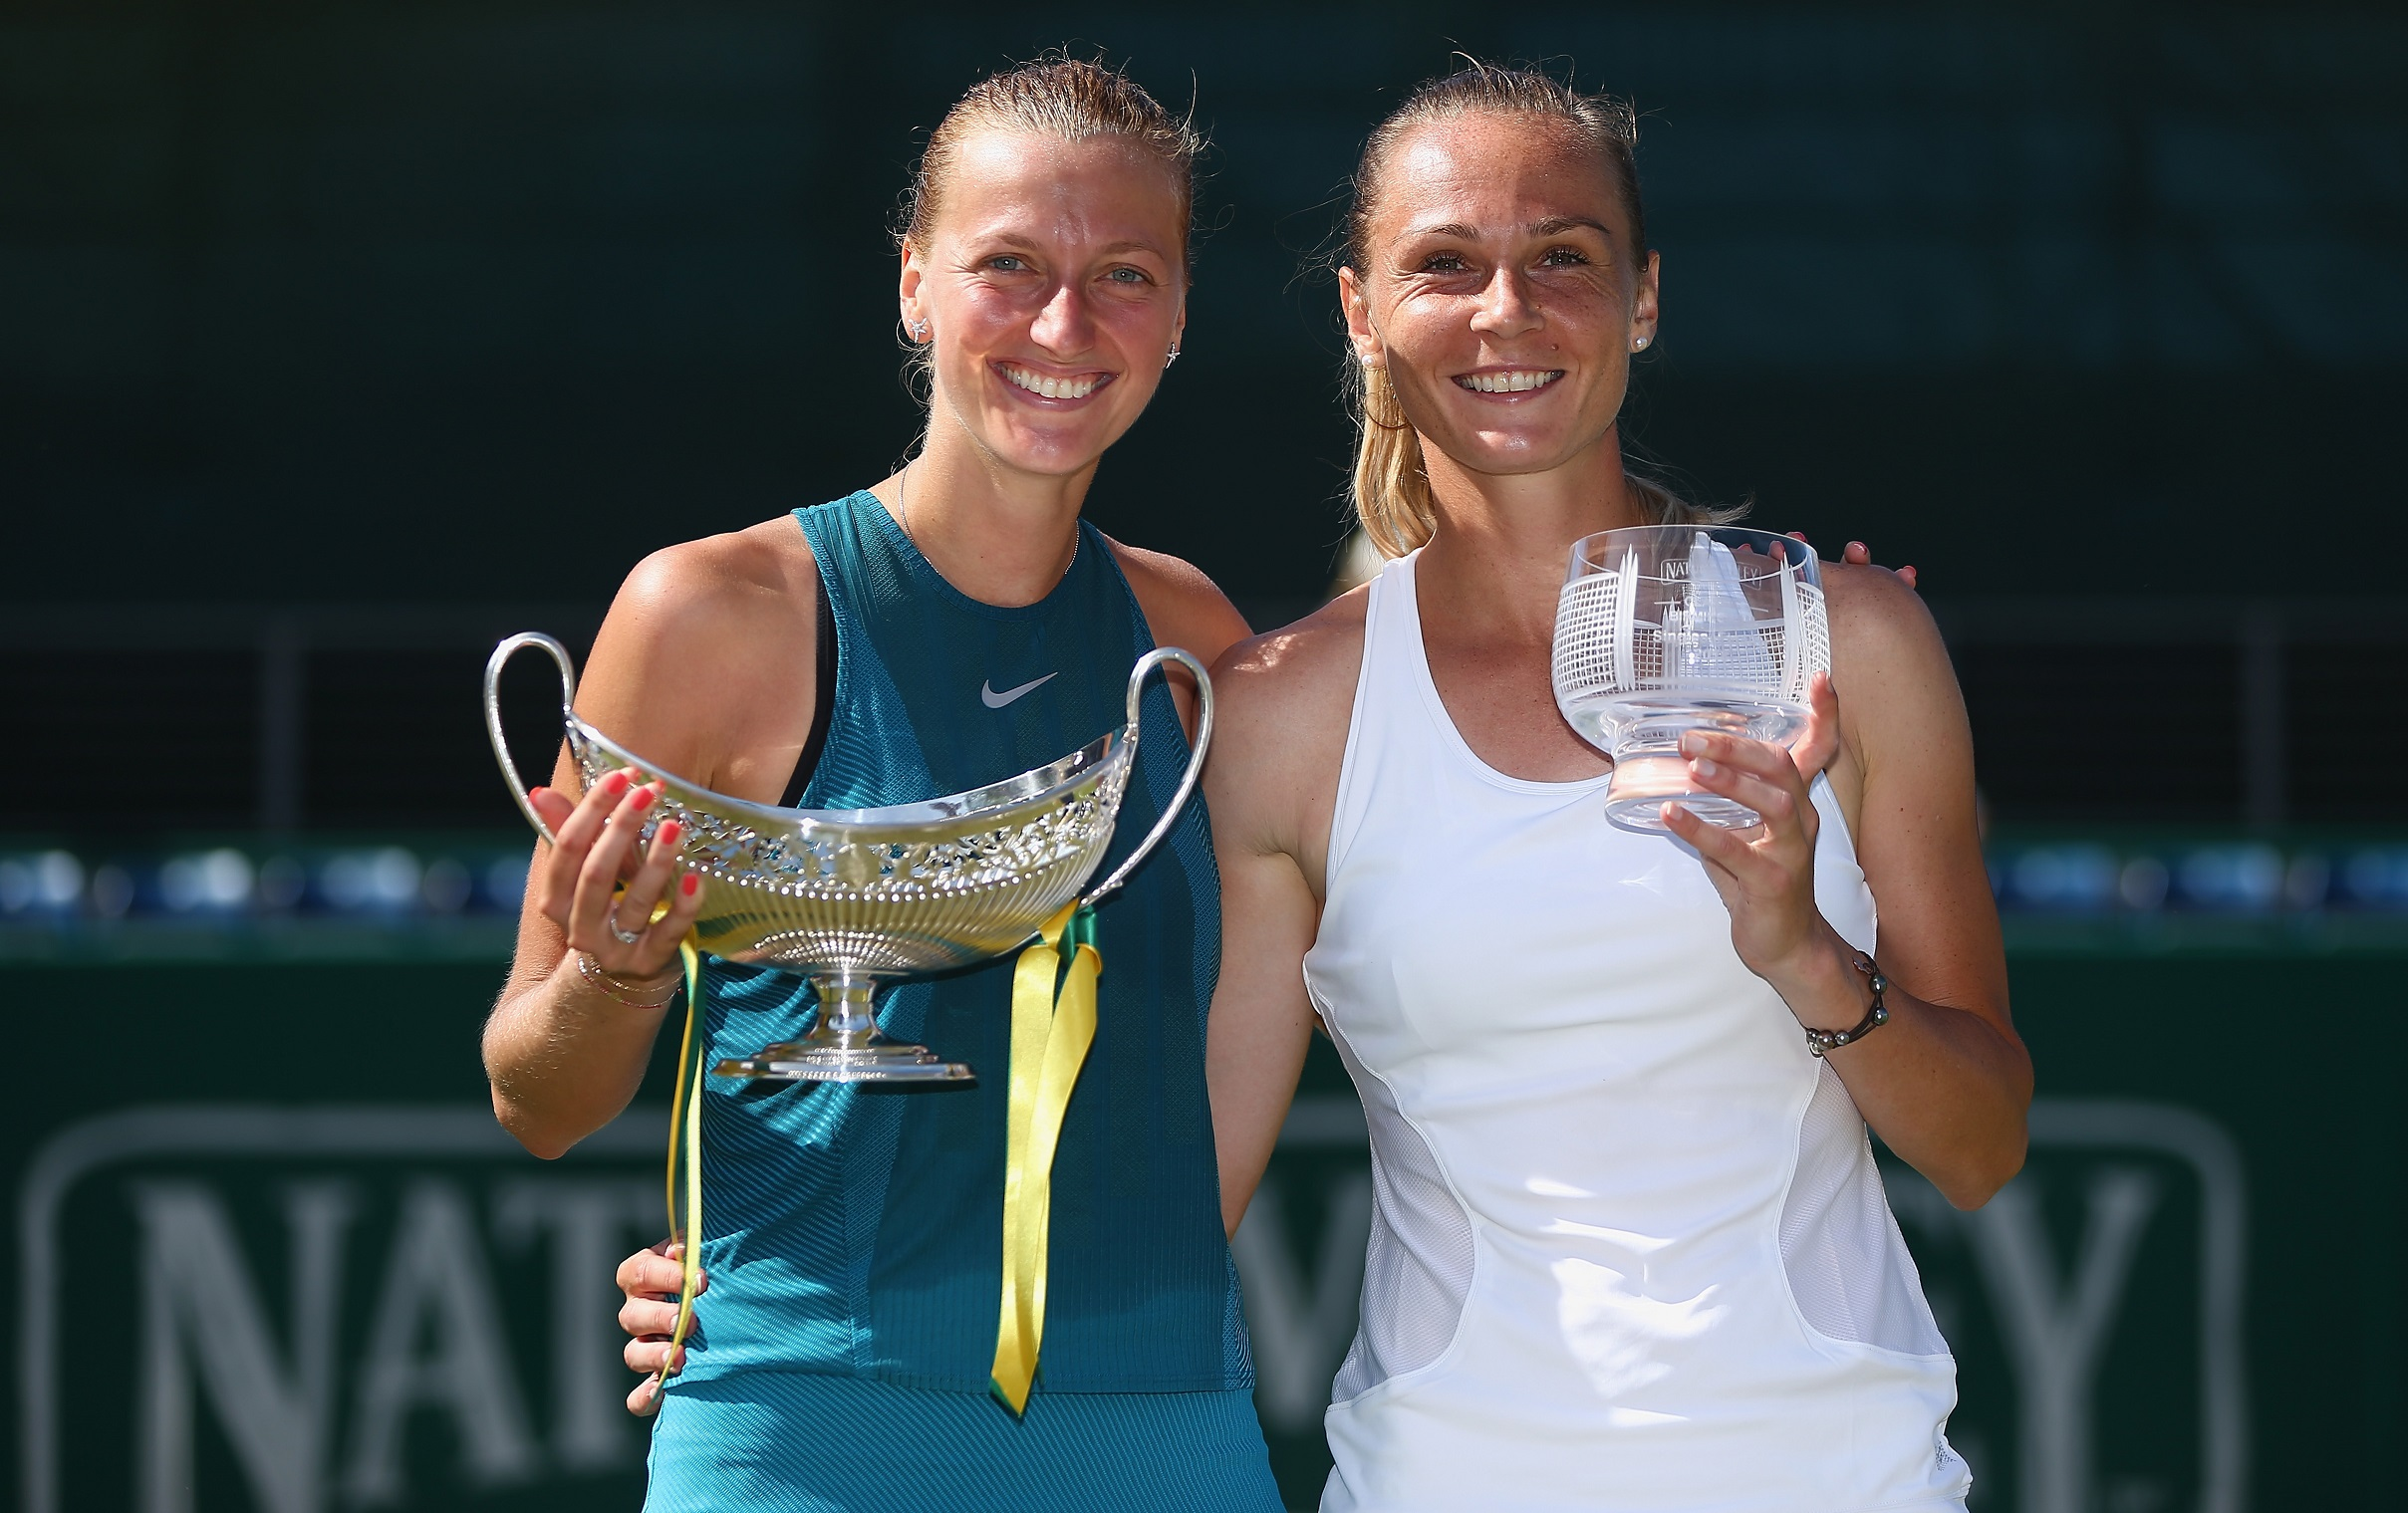 Tournament winner, Petra Kvitova of the Czech Republic and runner up Magdalena Rybarikova of Slovakia